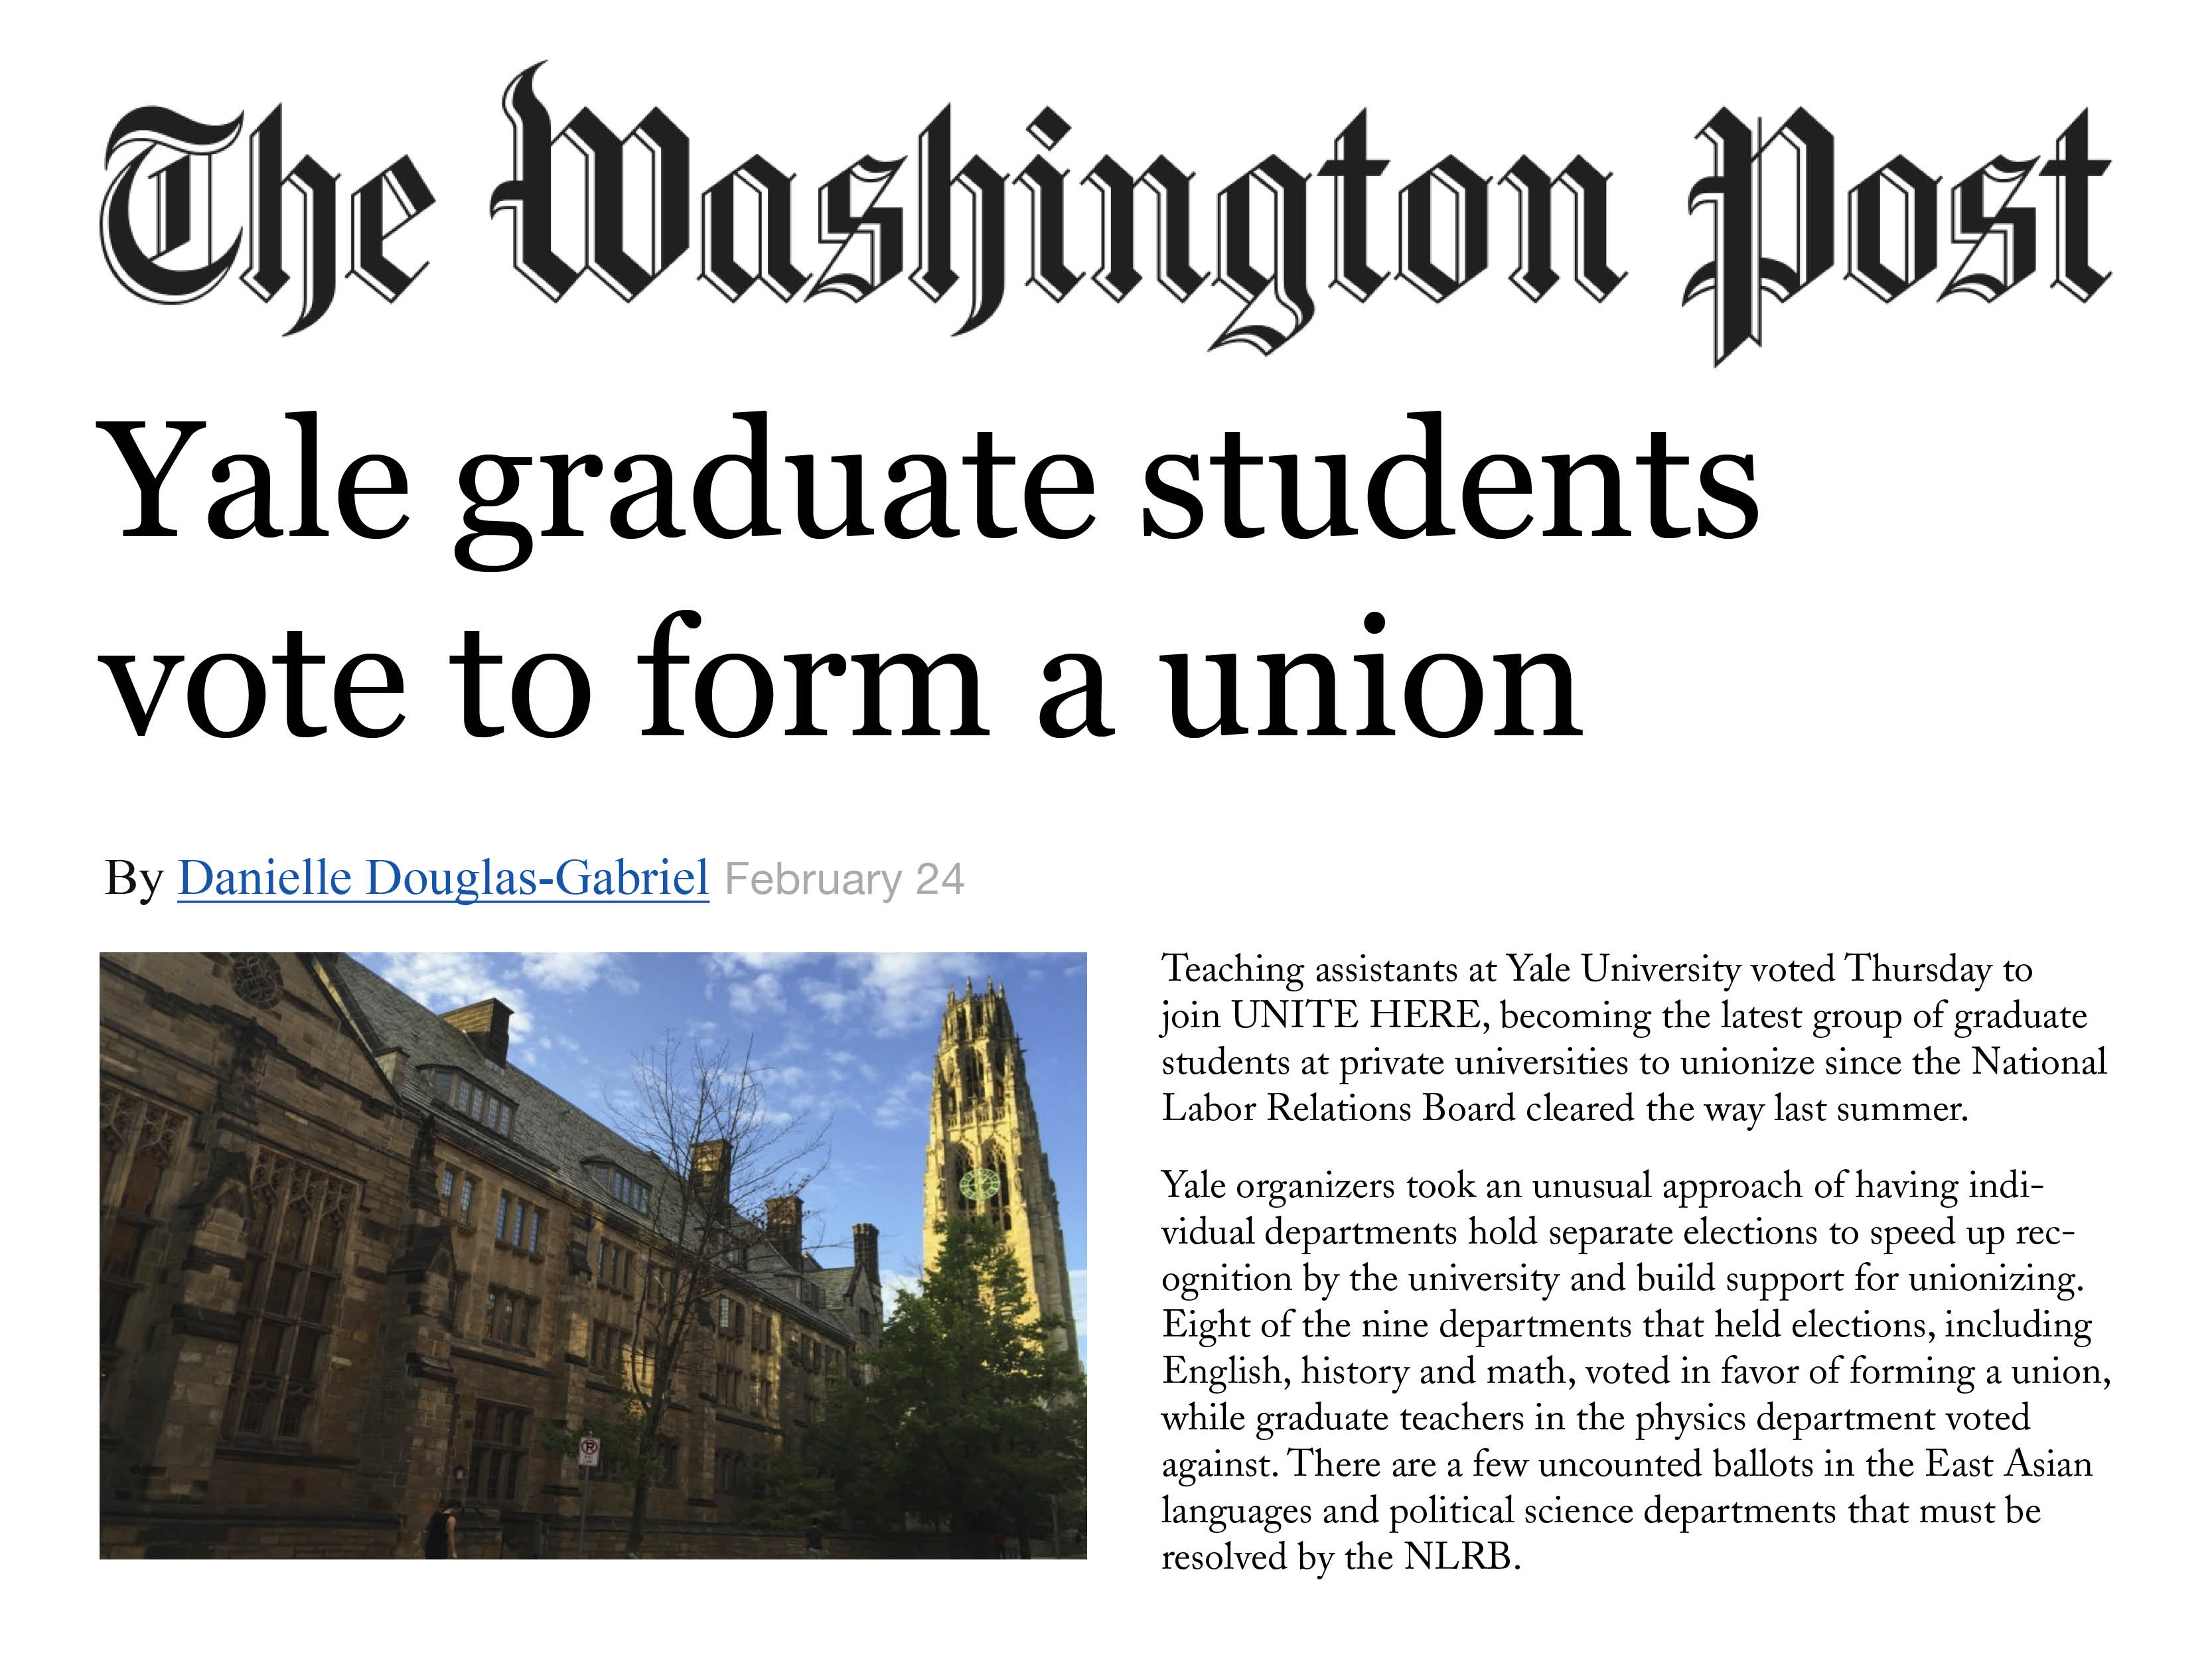 Washington Post - Yale graduate students vote to form a union